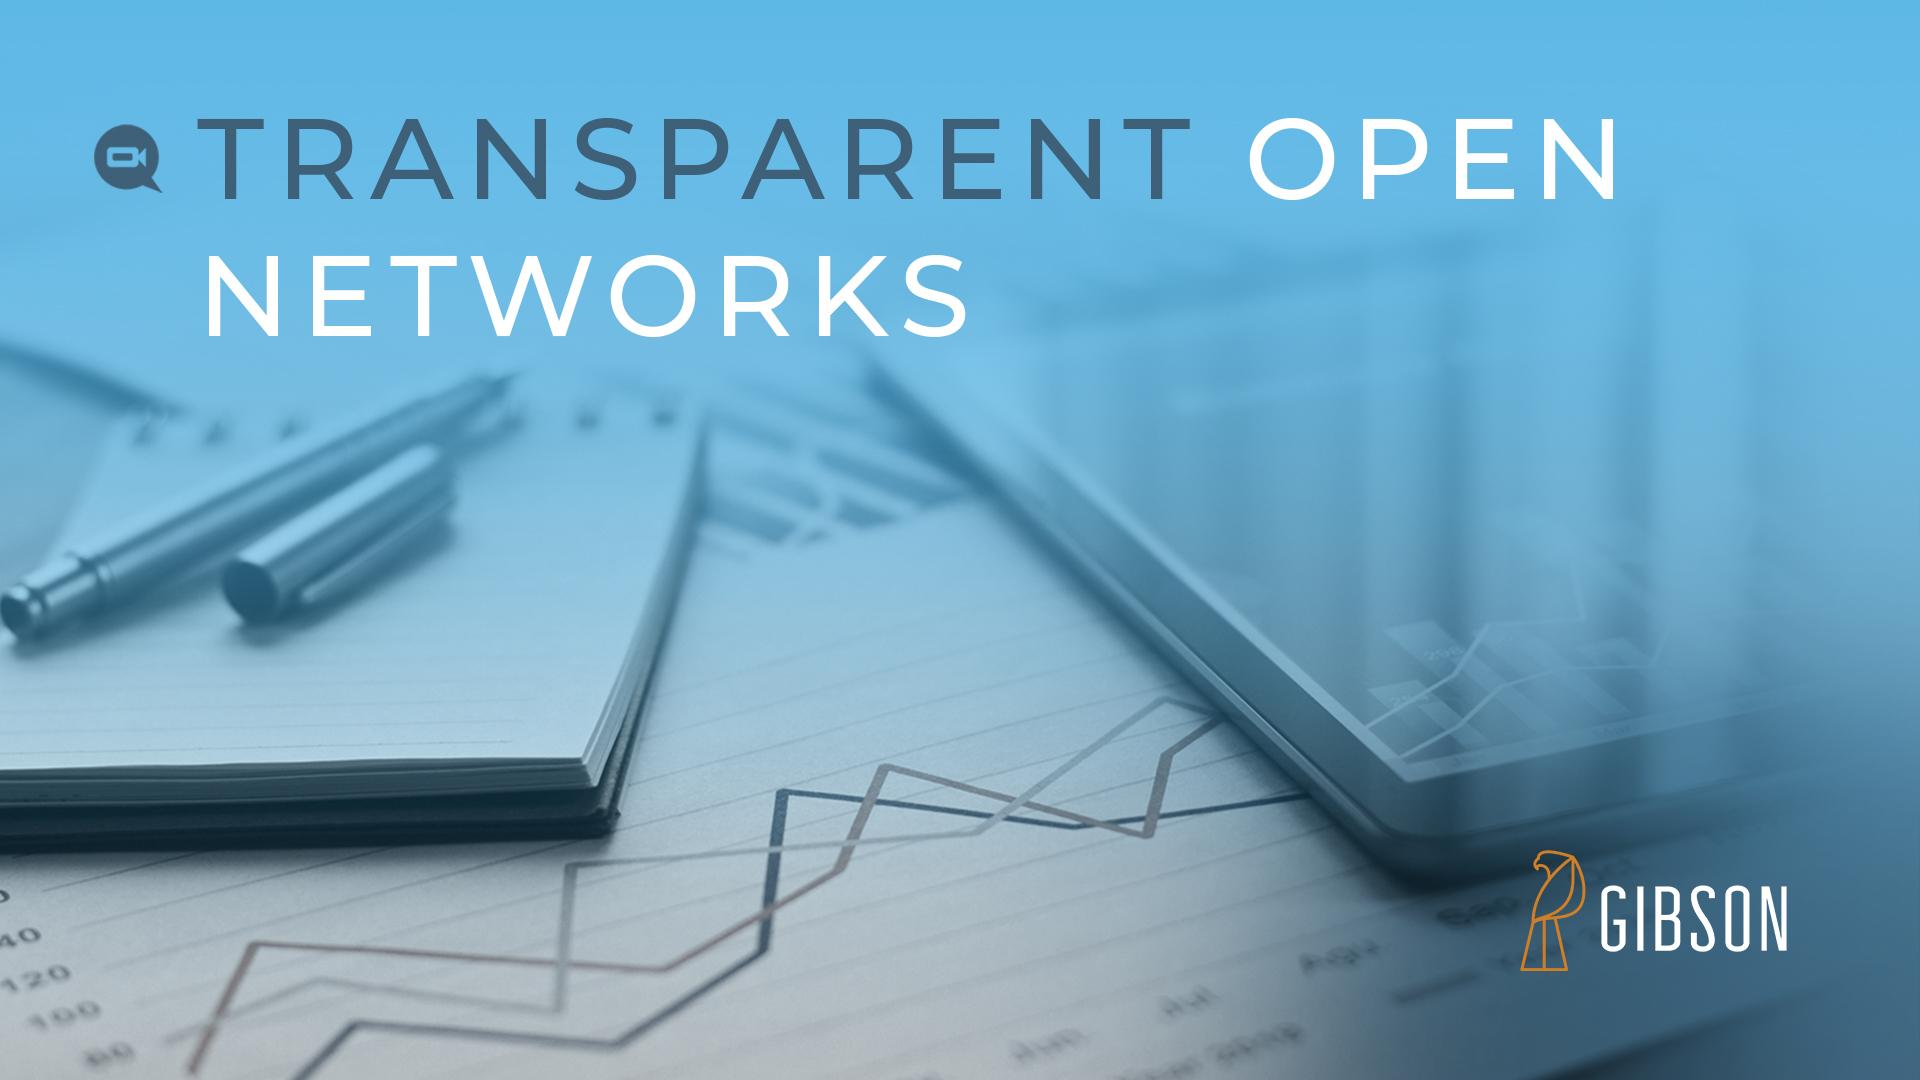 Transparent Open Networks